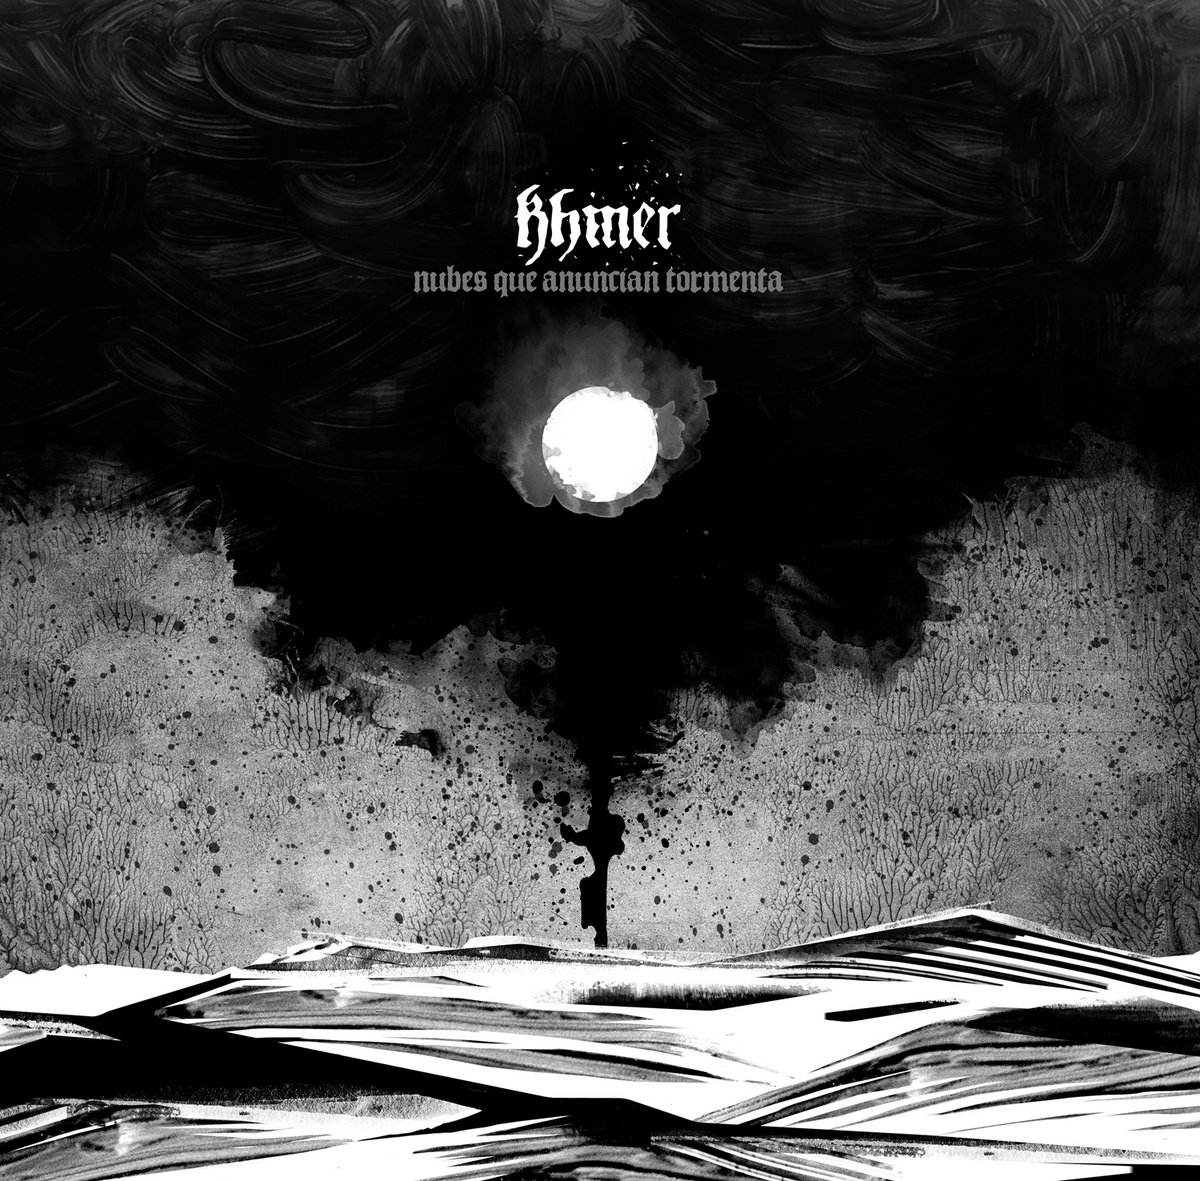 Khmer - Bajo La Cruz @ 'Nubes Que Anuncian Tormenta' album (metal, spain)